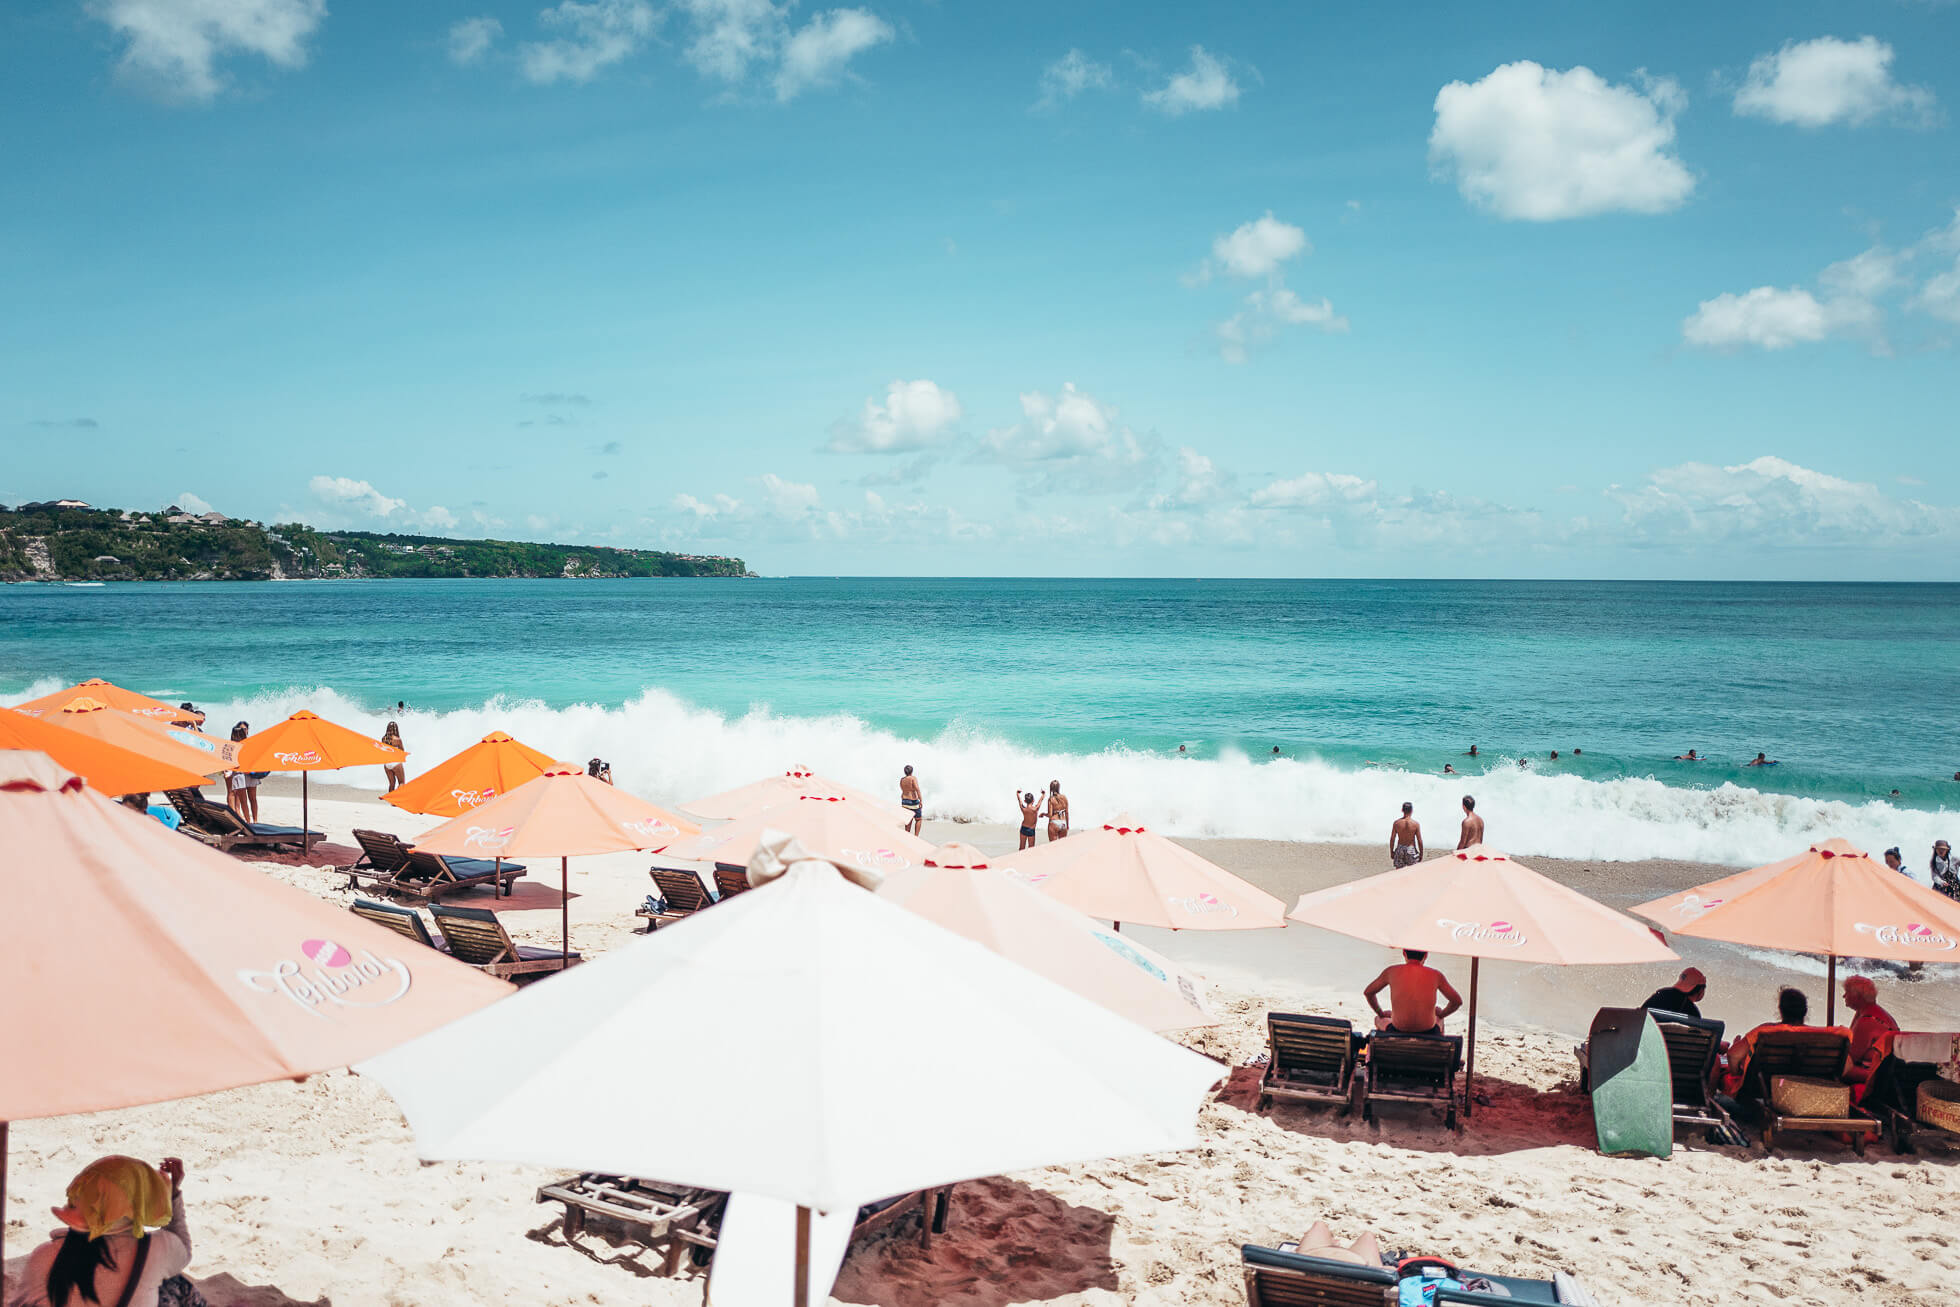 janni-deler-dreamland-beach-baliL1010618